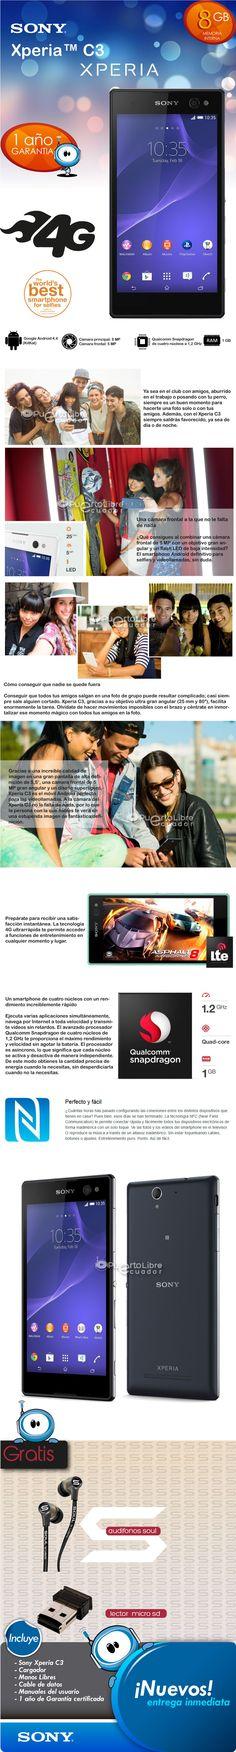 Sony Xperia C3 - Quad Core - Wifi - Gps - Nfc + R E G A L O